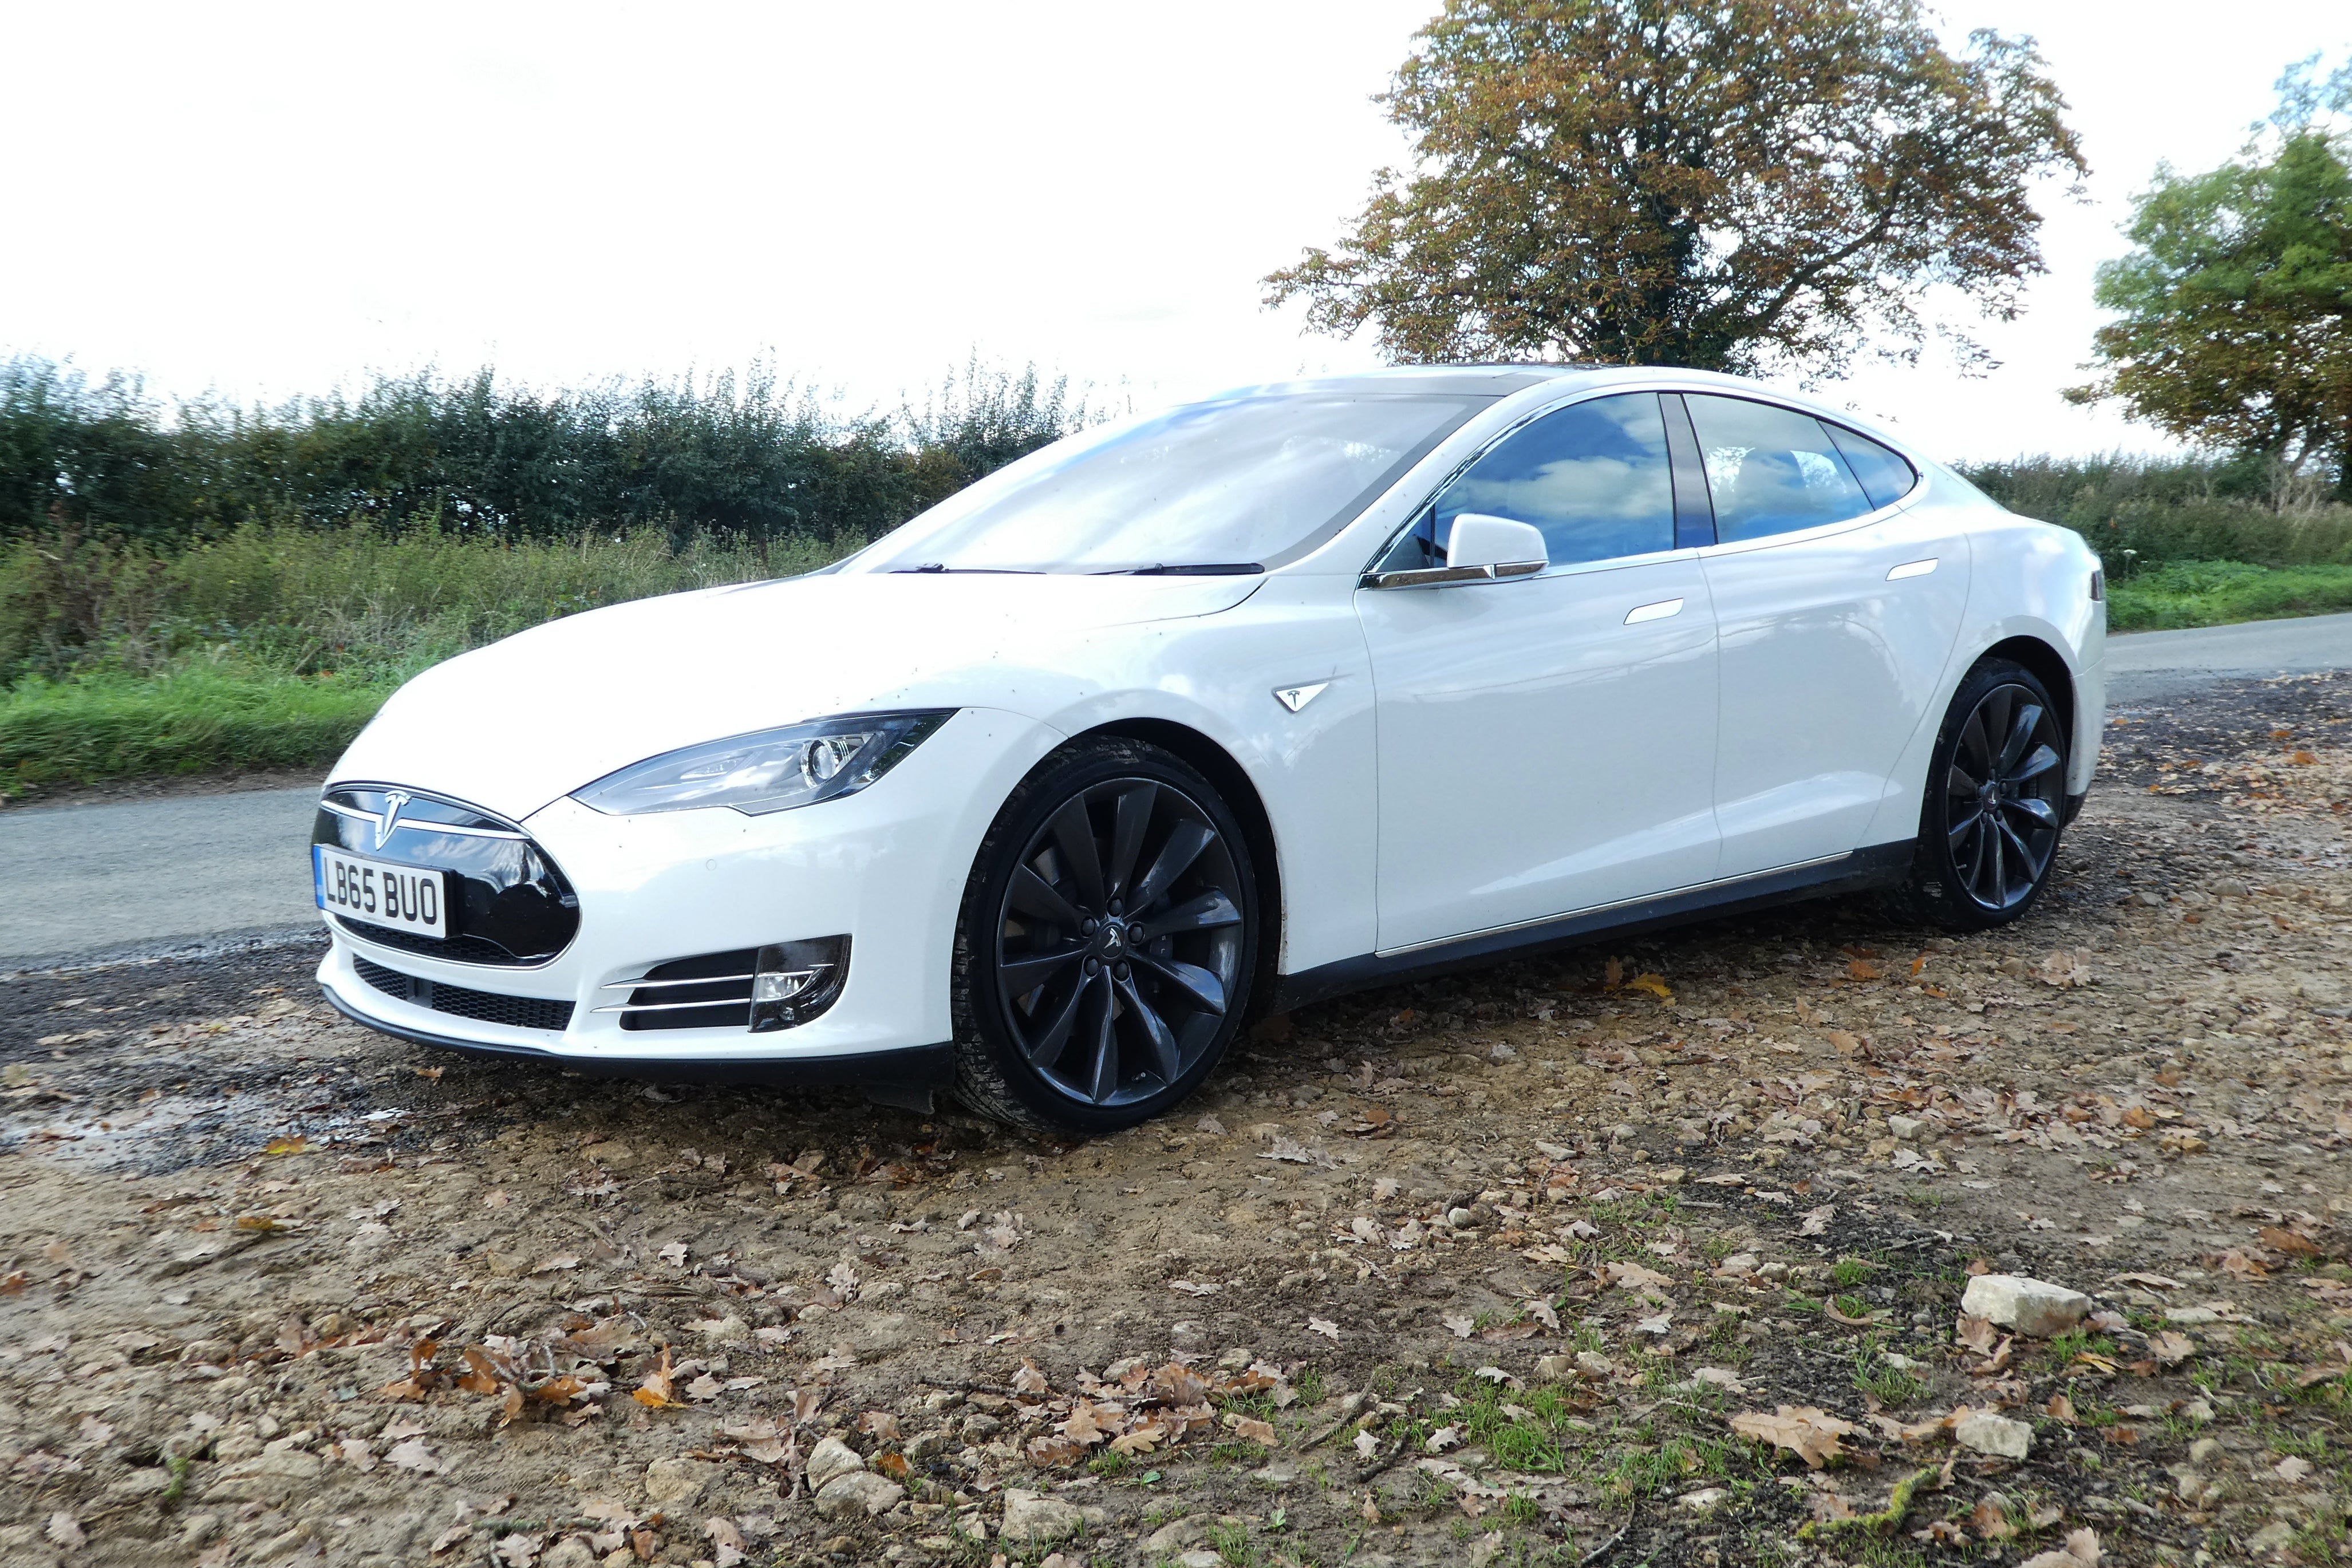 Tesla Model S Left Side View